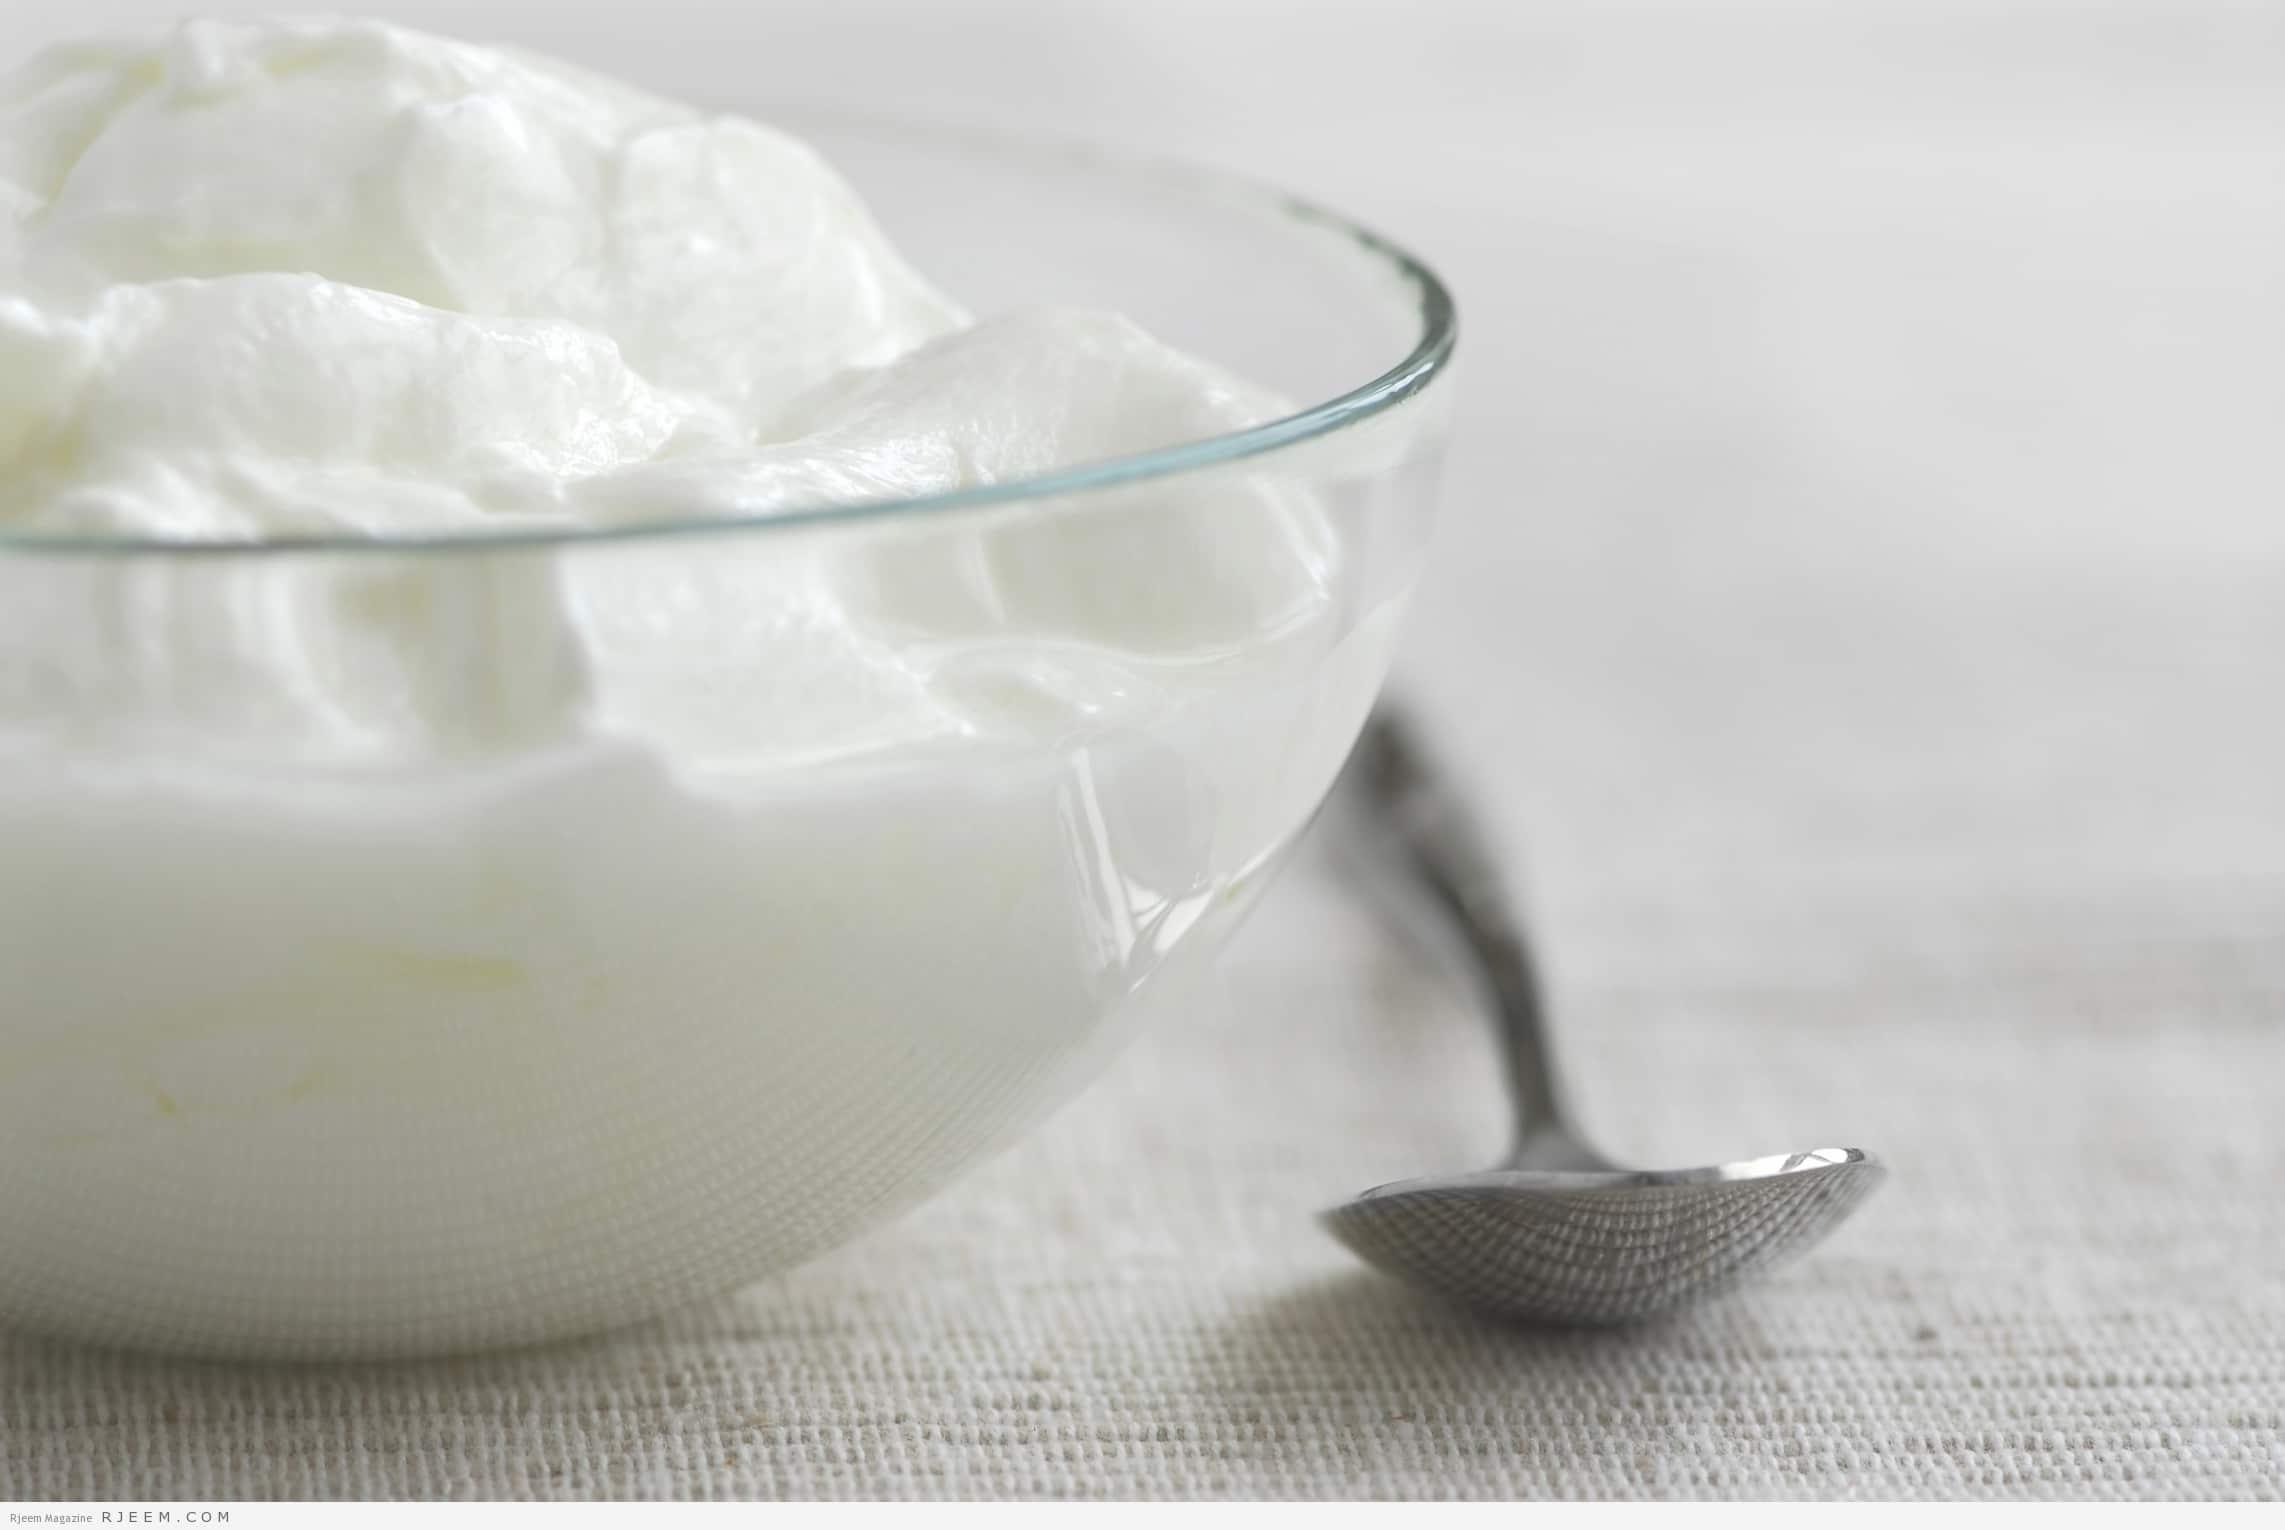 Fresh yogurt served in a clear glass bowl